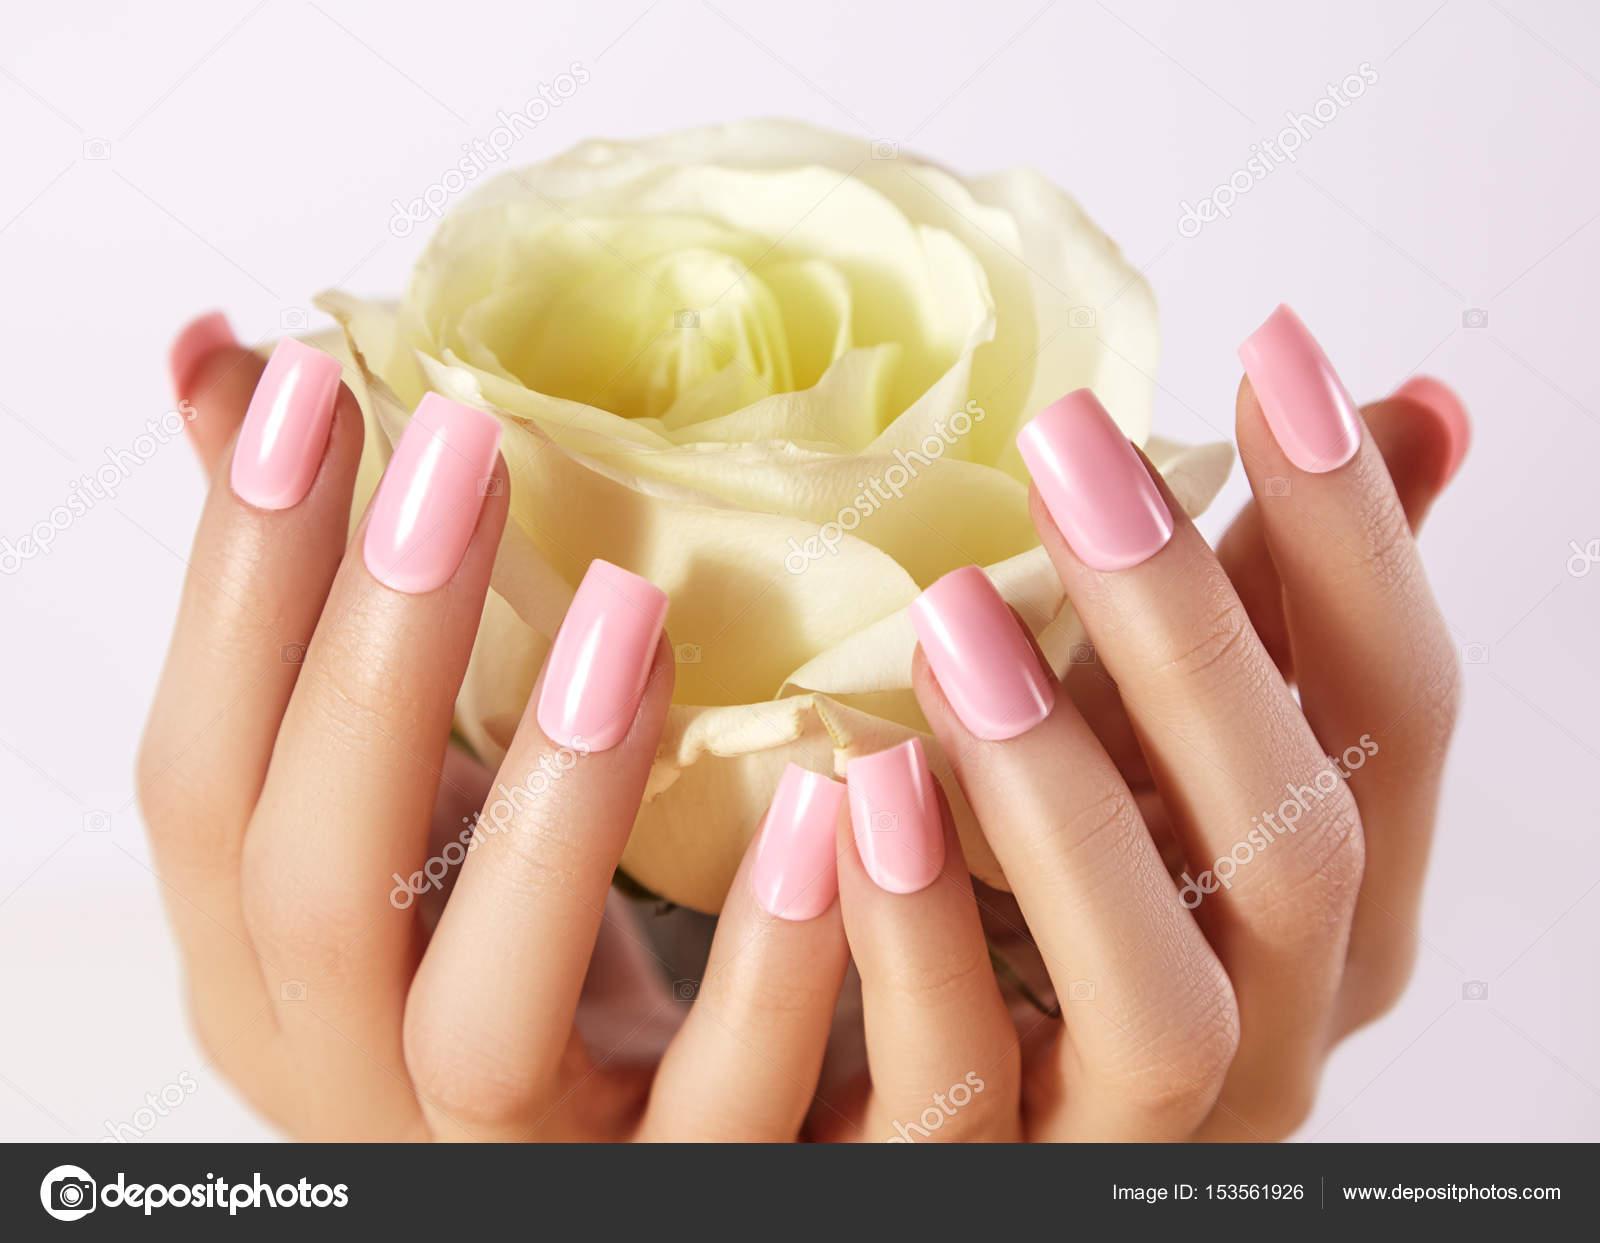 Manicured nails with pink nail polish. Manicure with nailpolish ...